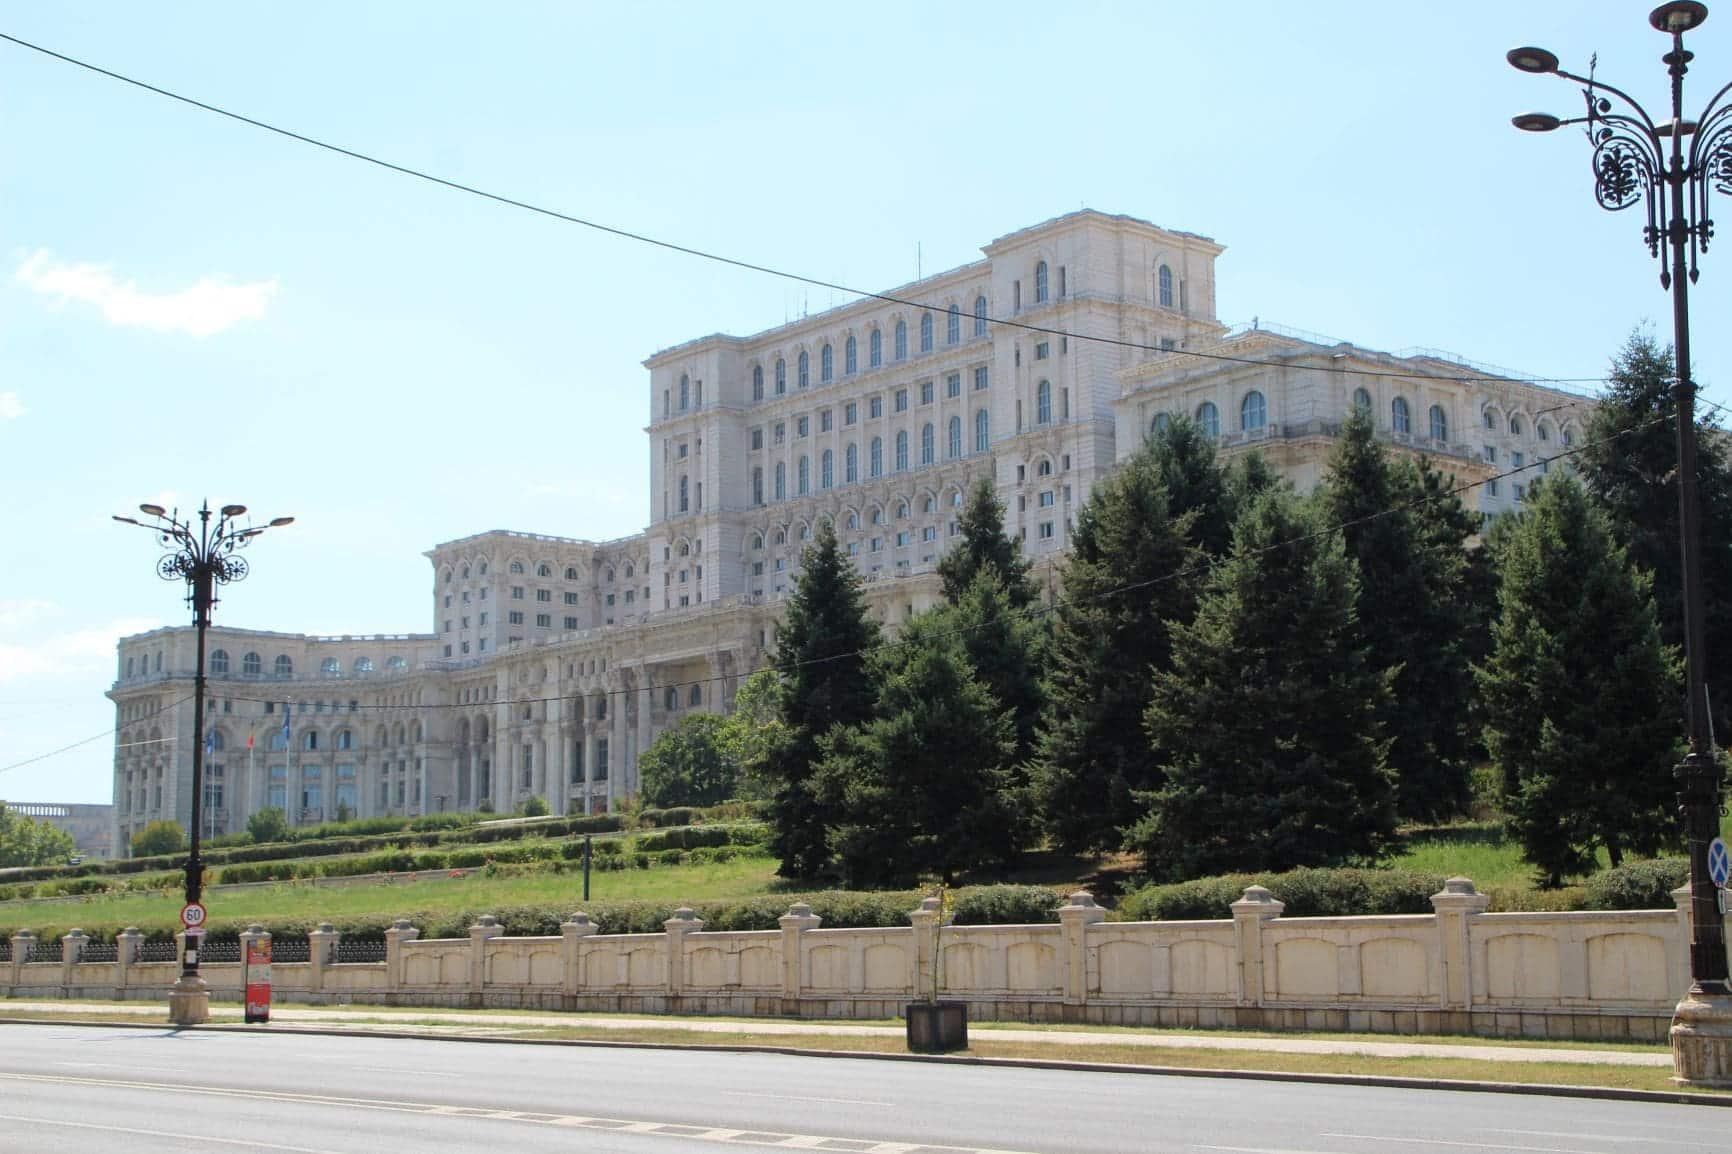 Parlementesgebouw Boekarest